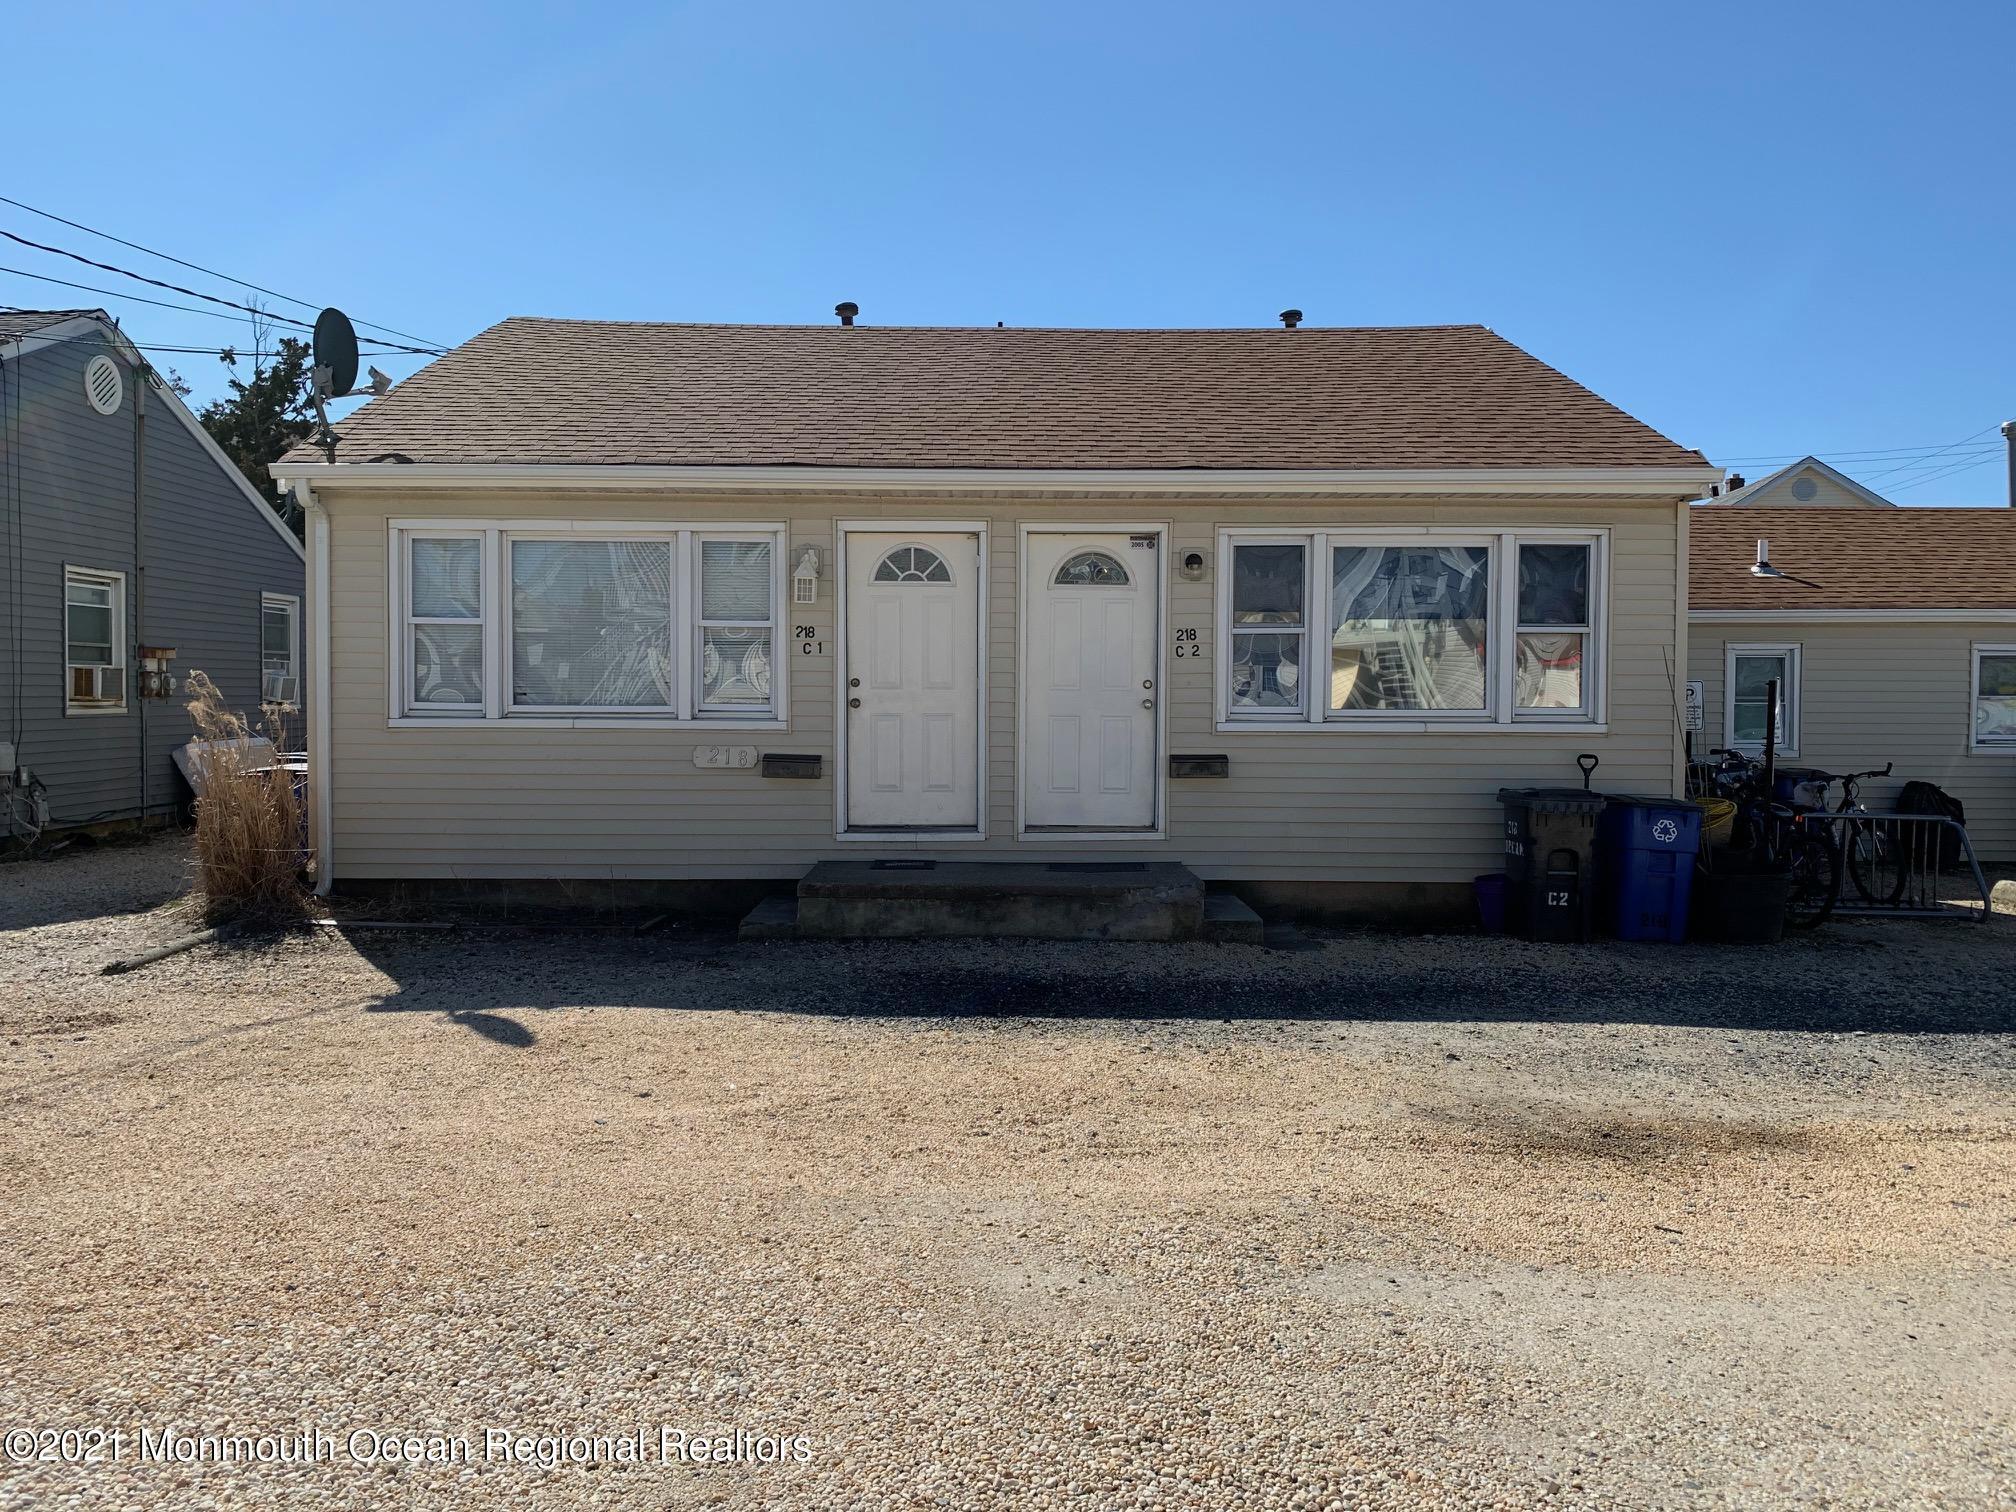 218 Ocean Avenue, Point Pleasant Beach, New Jersey 08742, 4 Bedrooms Bedrooms, ,2 BathroomsBathrooms,Multifamily,For Sale,218 Ocean Avenue,1,22107449